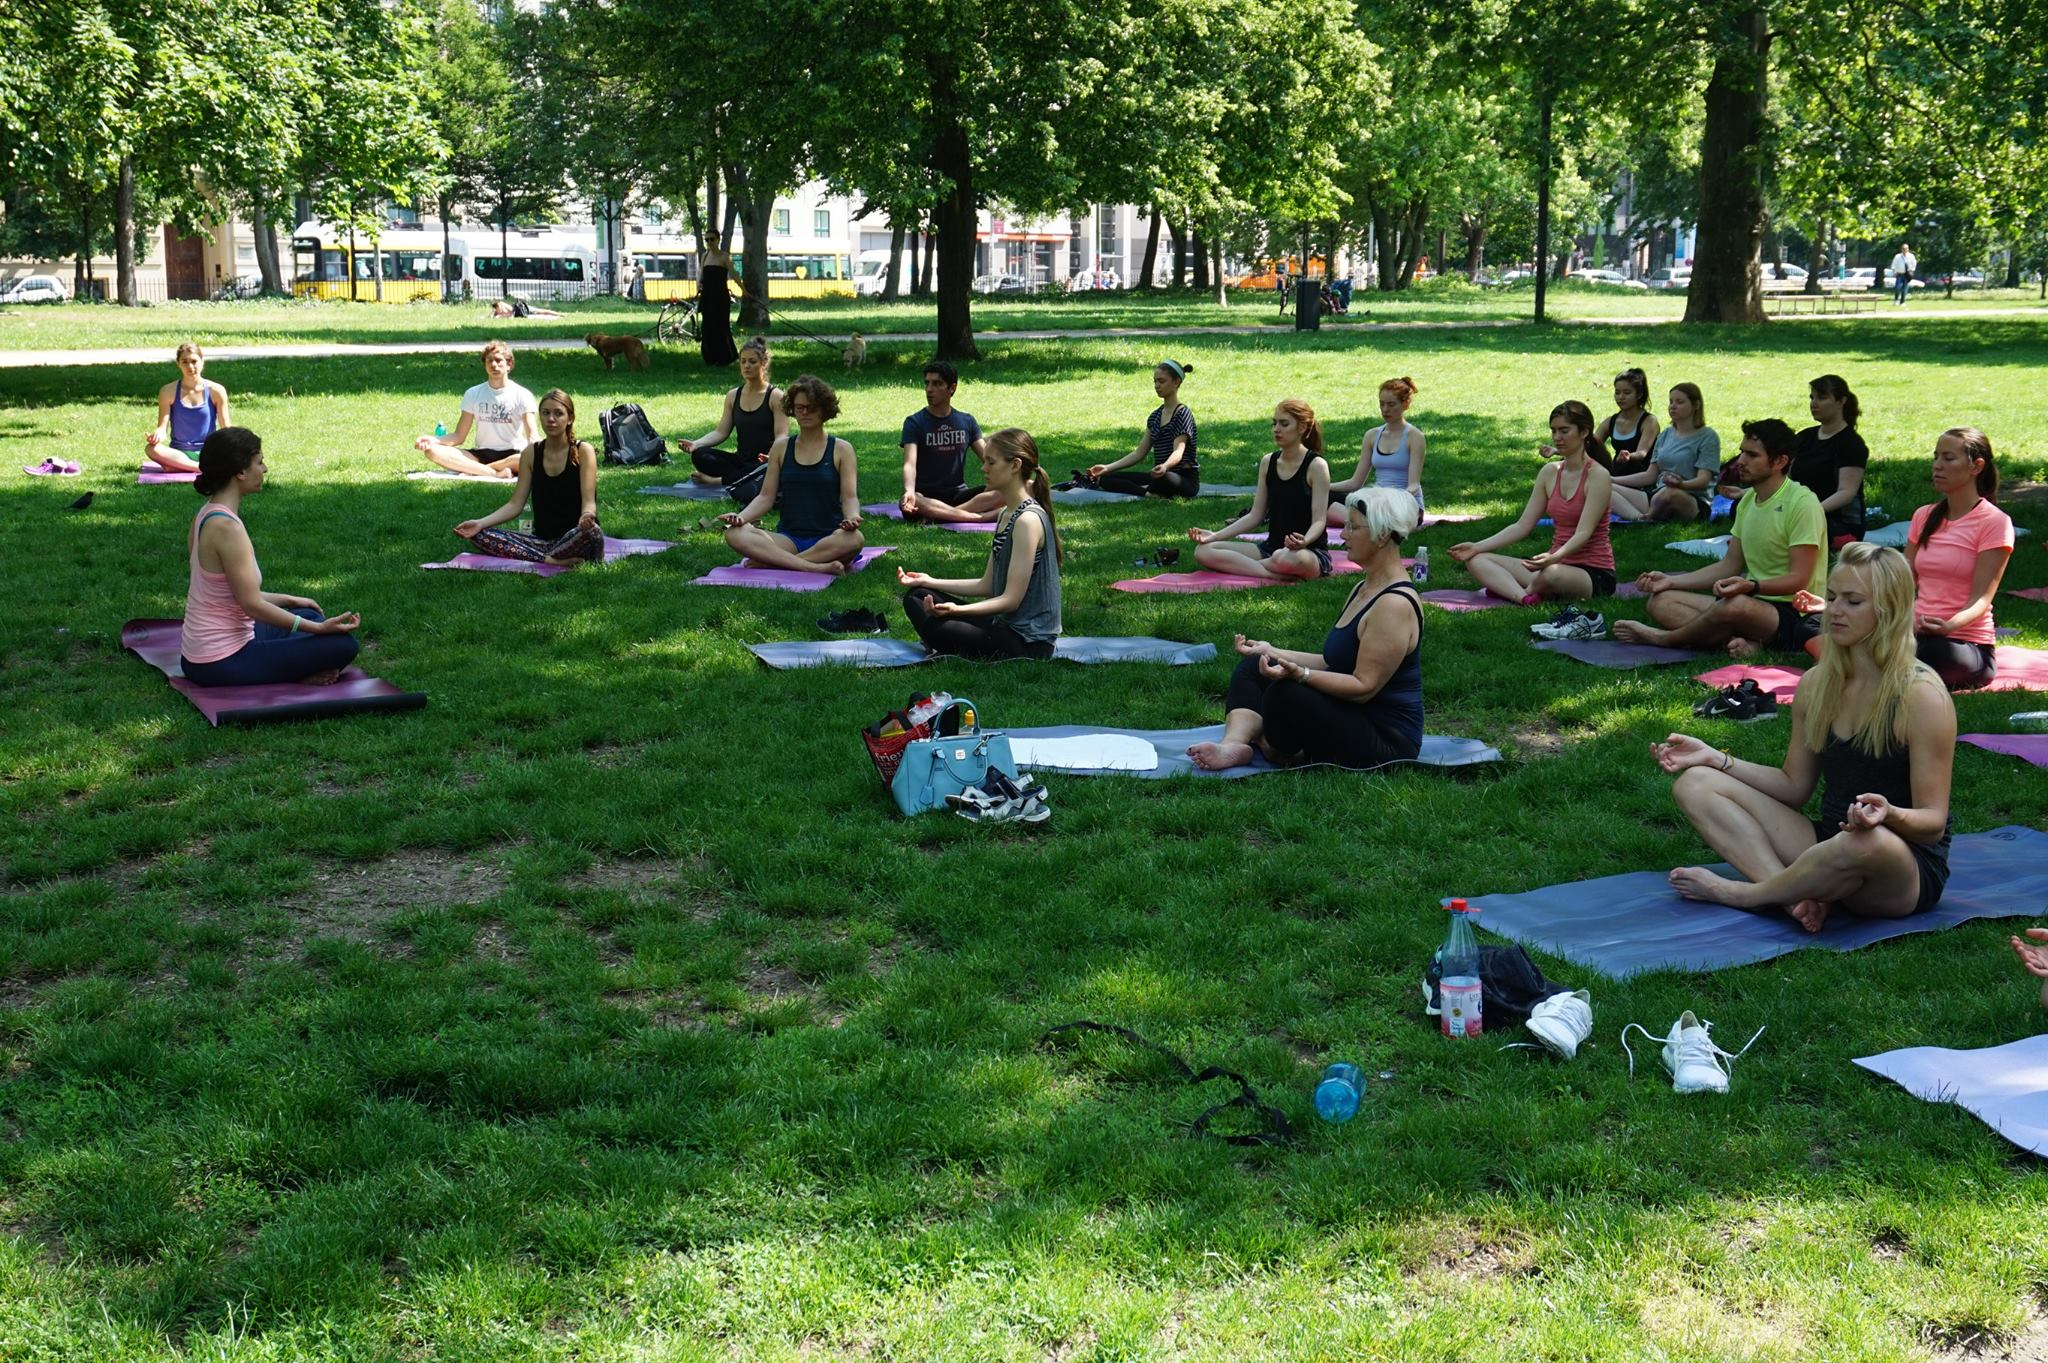 Yoga im Monbijou Park, Berlin | ©lululemon,Christina Metzler